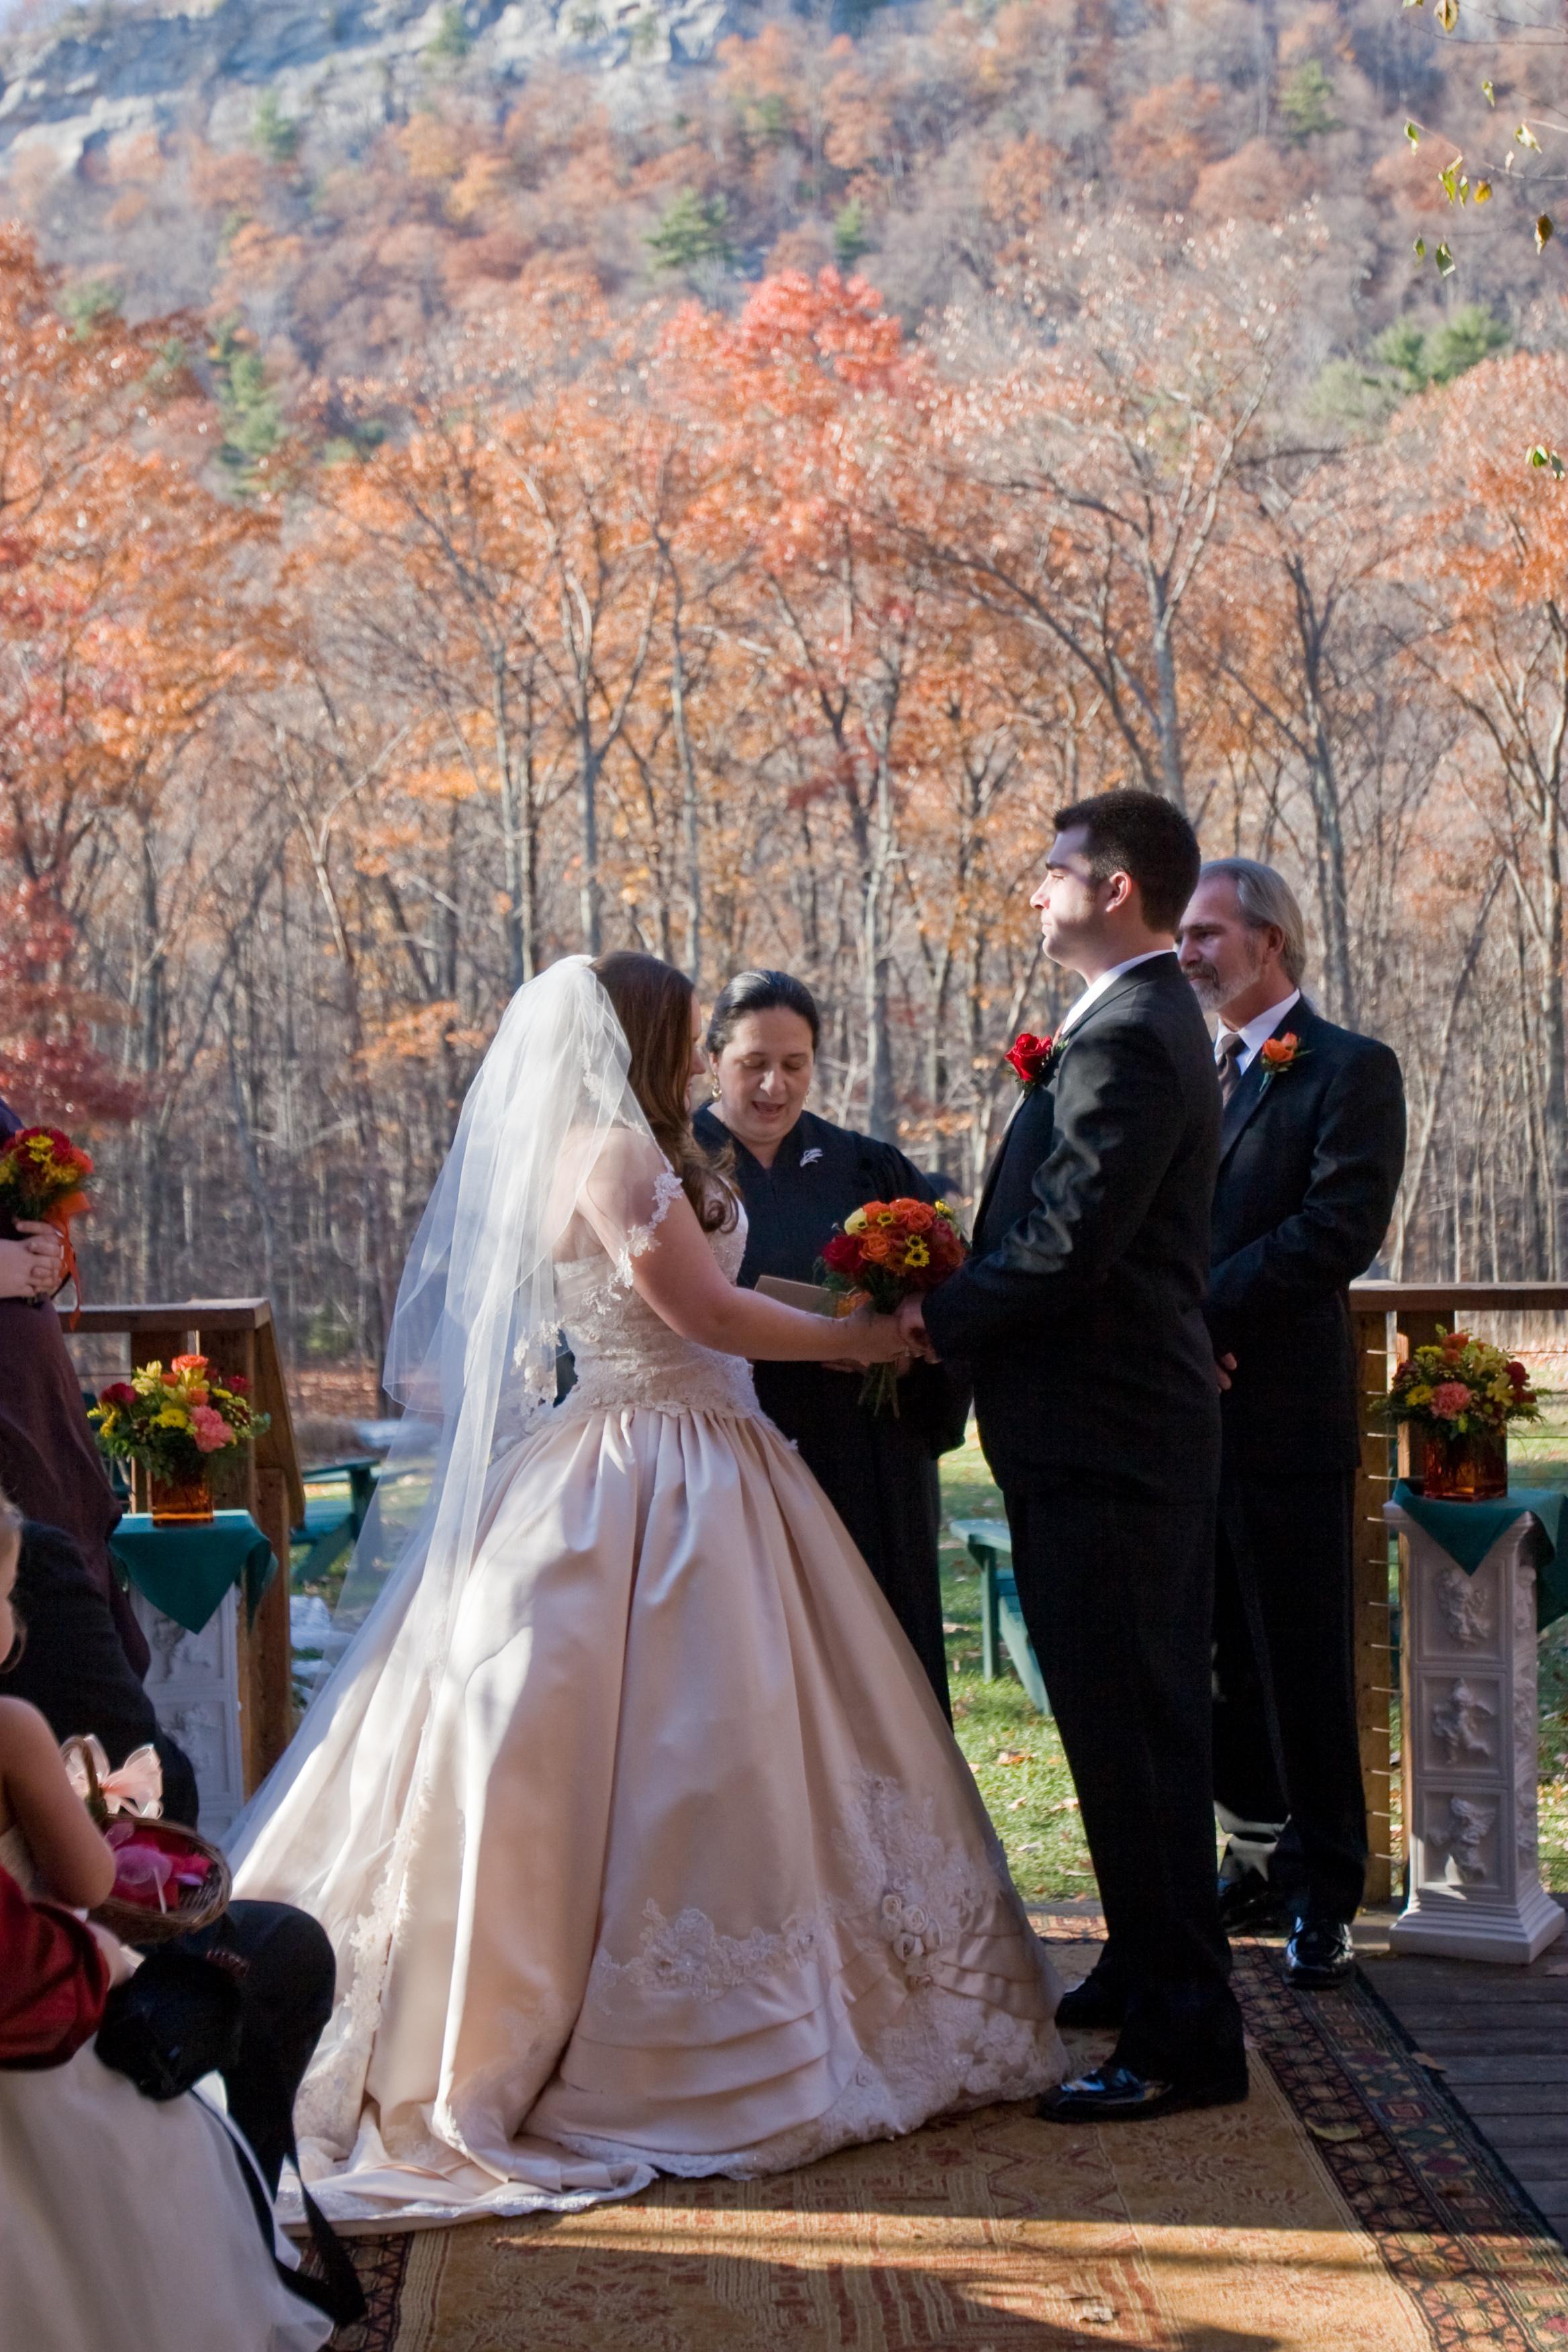 Ceremony, Flowers & Decor, Ceremony Flowers, Flowers, Vows, Officiant, Lodge, Minnewaska